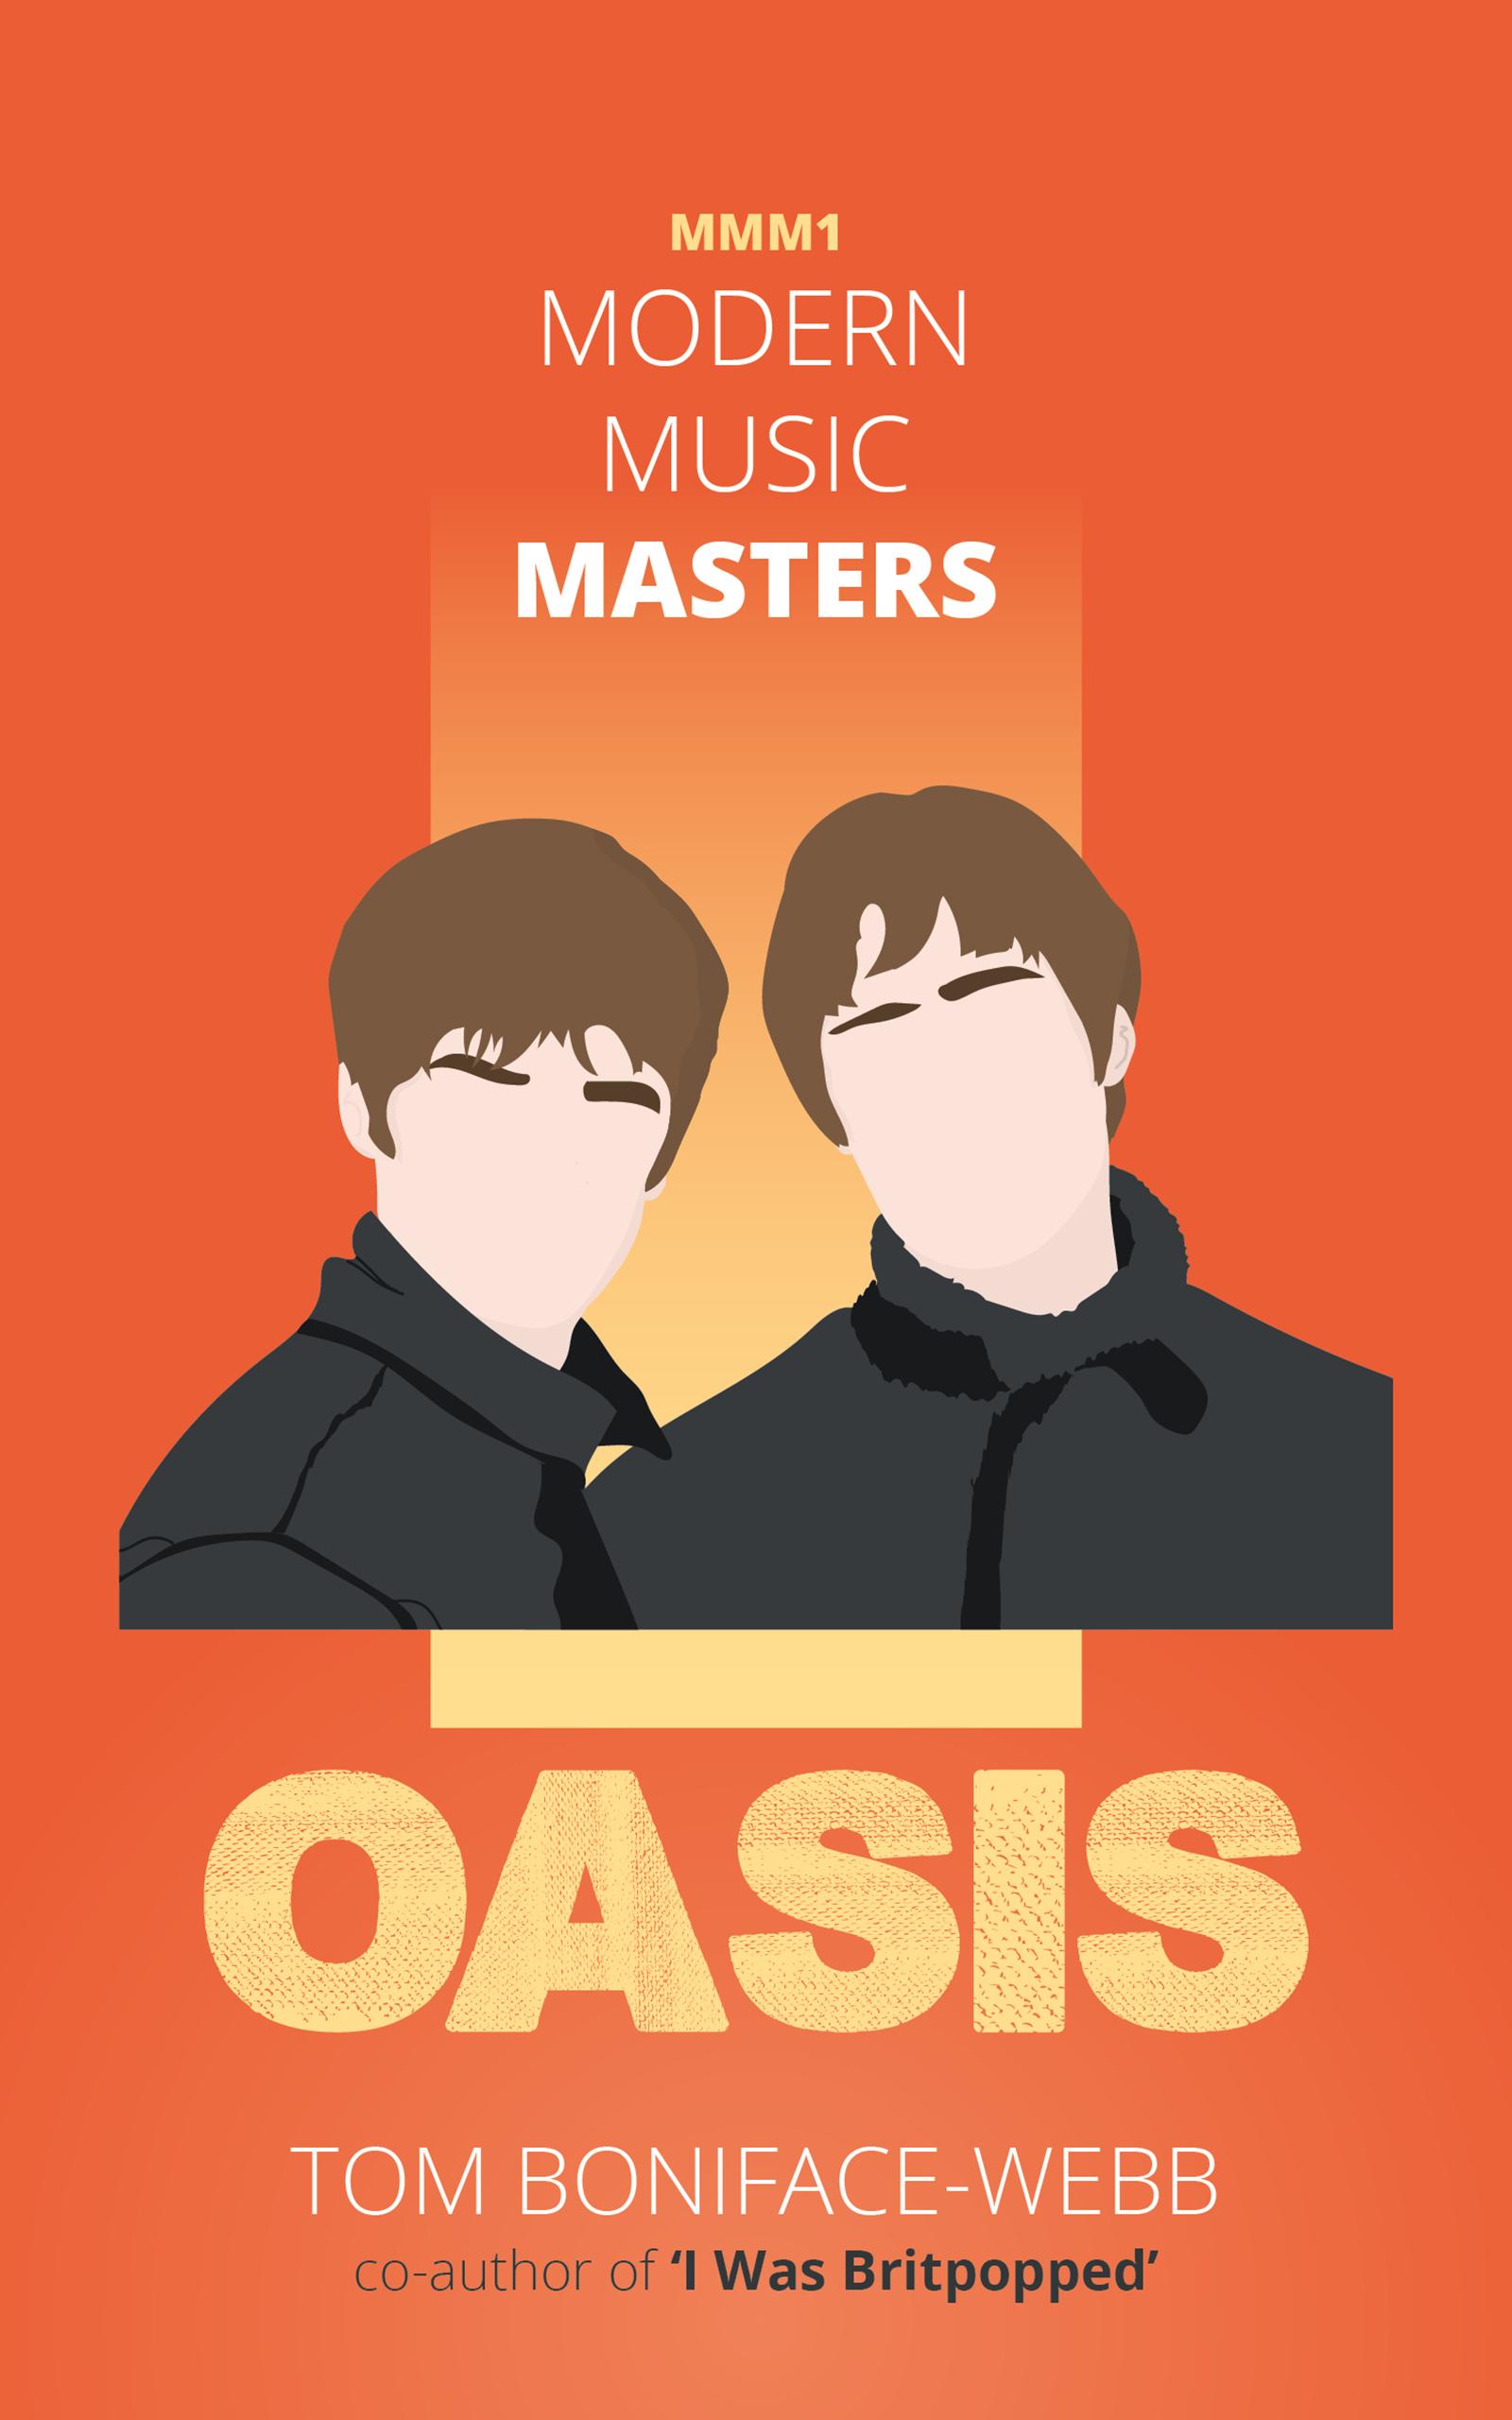 Modern Music Masters - Oasis